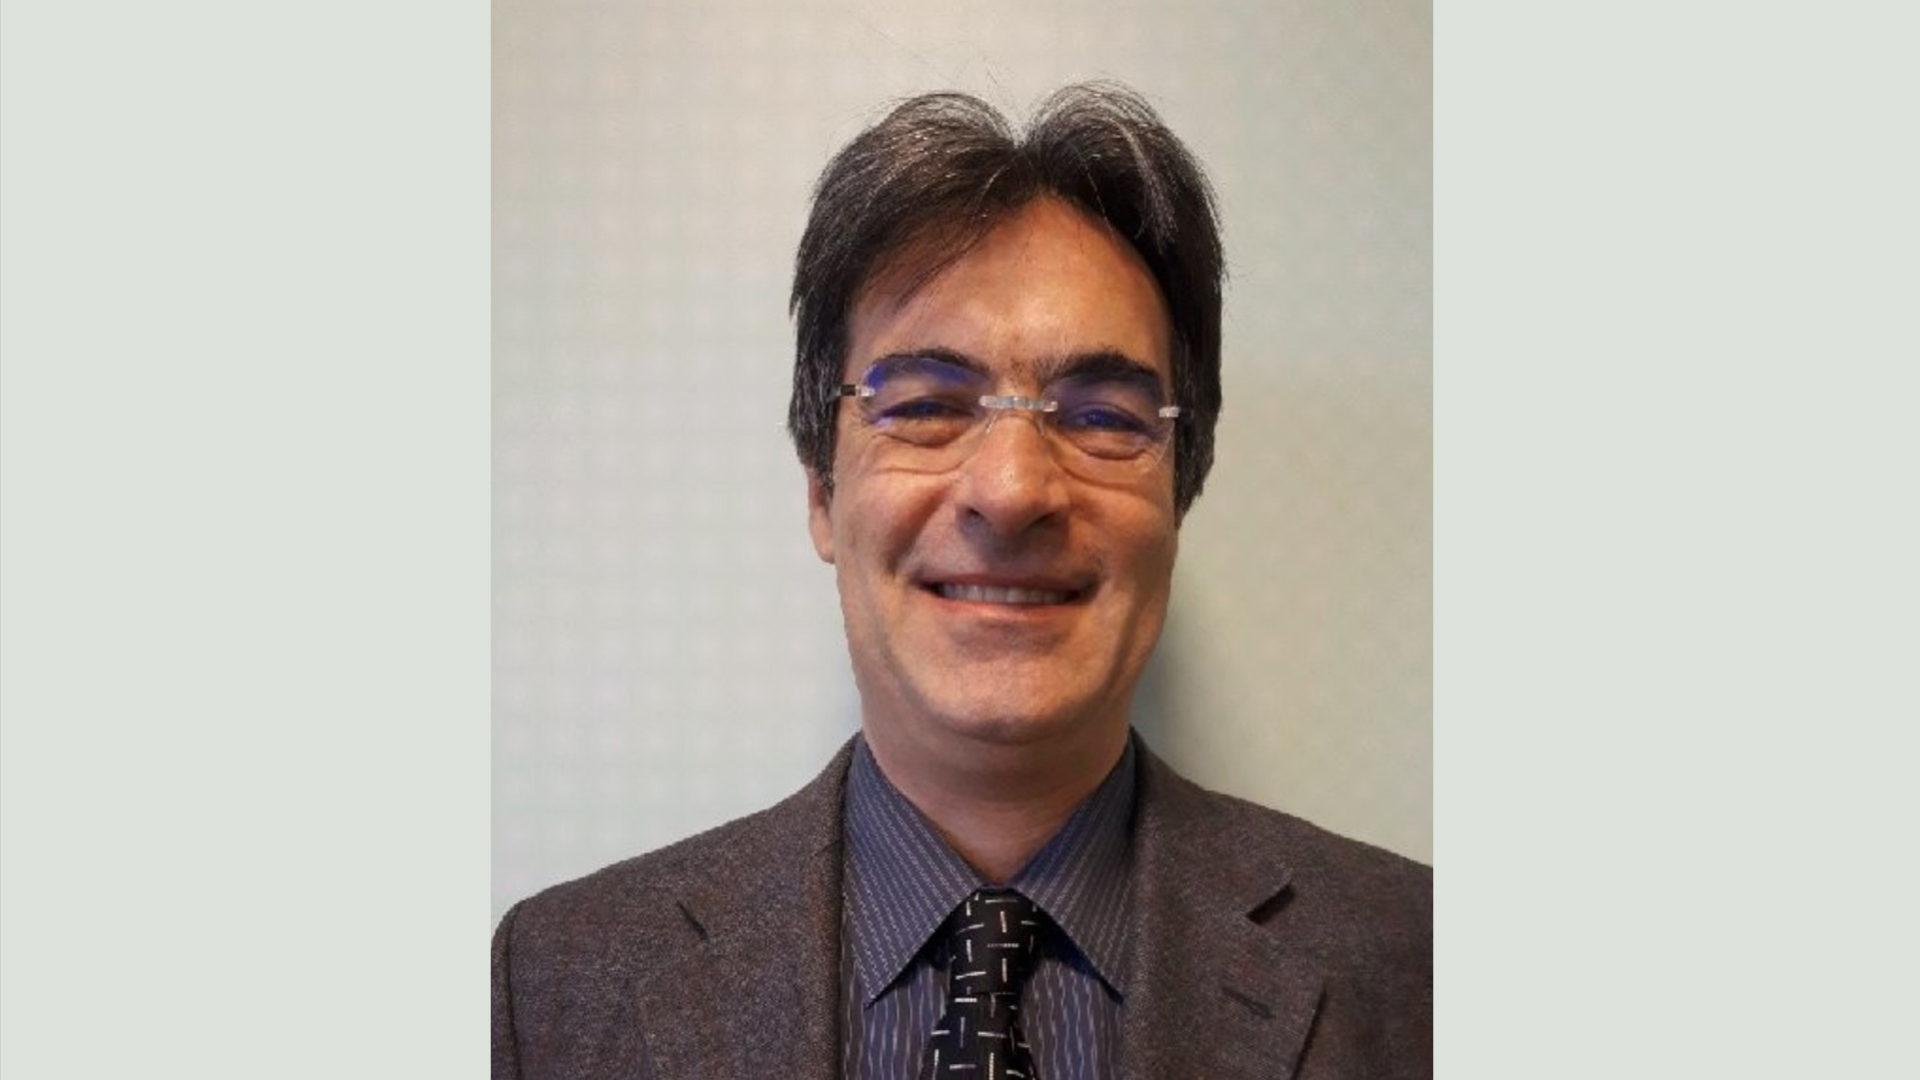 foto Giuseppe Sindoni ha parlato di Data governance e analytics